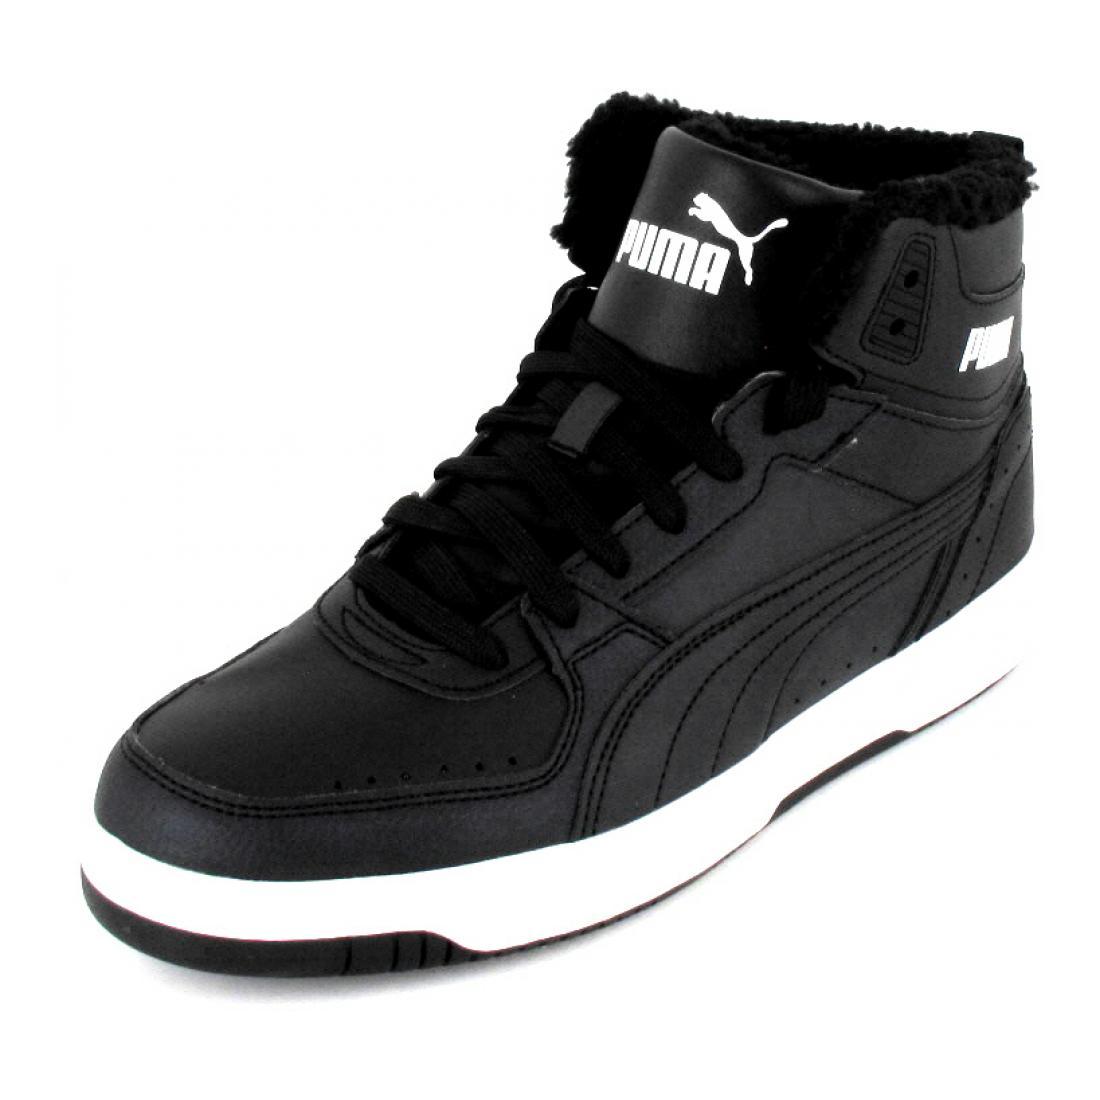 Puma Sneaker high Rebound JOY Fur